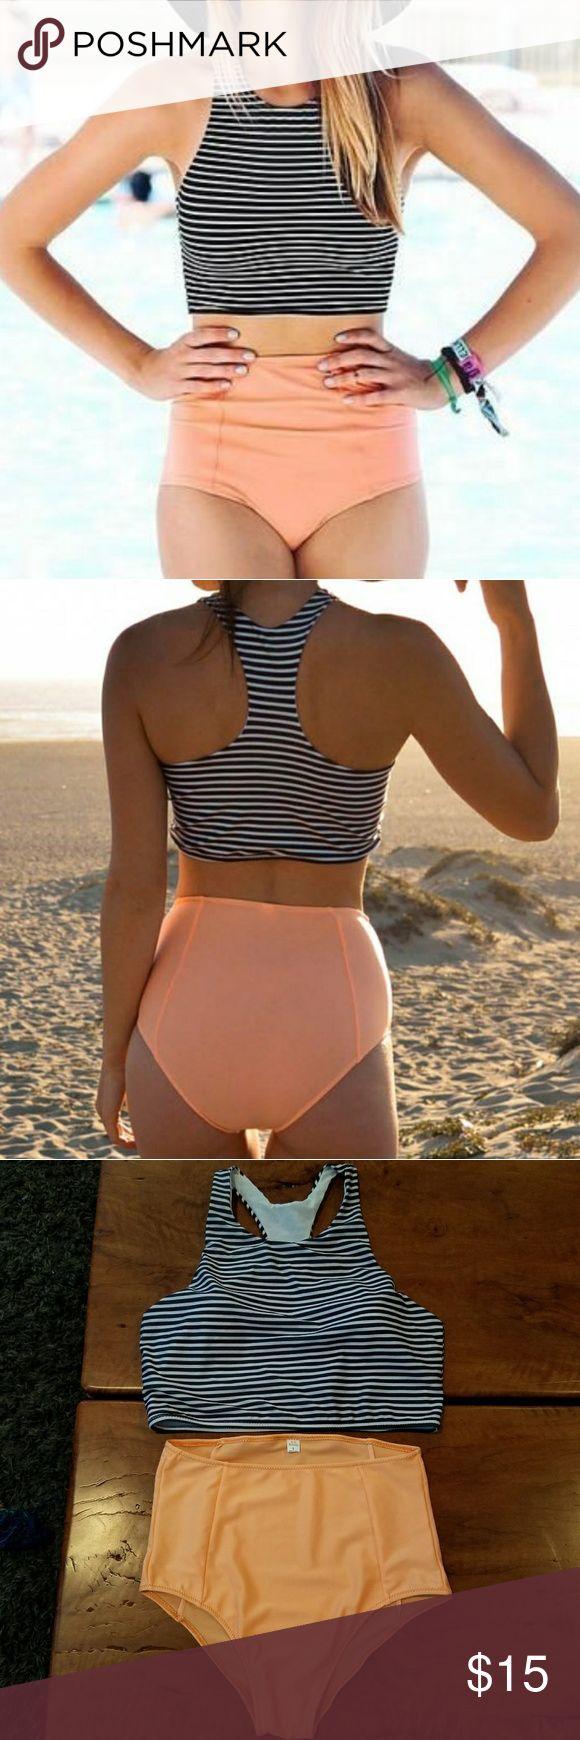 High waisted bikini set Black & white striped razor back bikini top with cups. Coral high waisted bikini bottoms. Size large better fits a size medium. Brand new never worn but no tags. Swim Bikinis